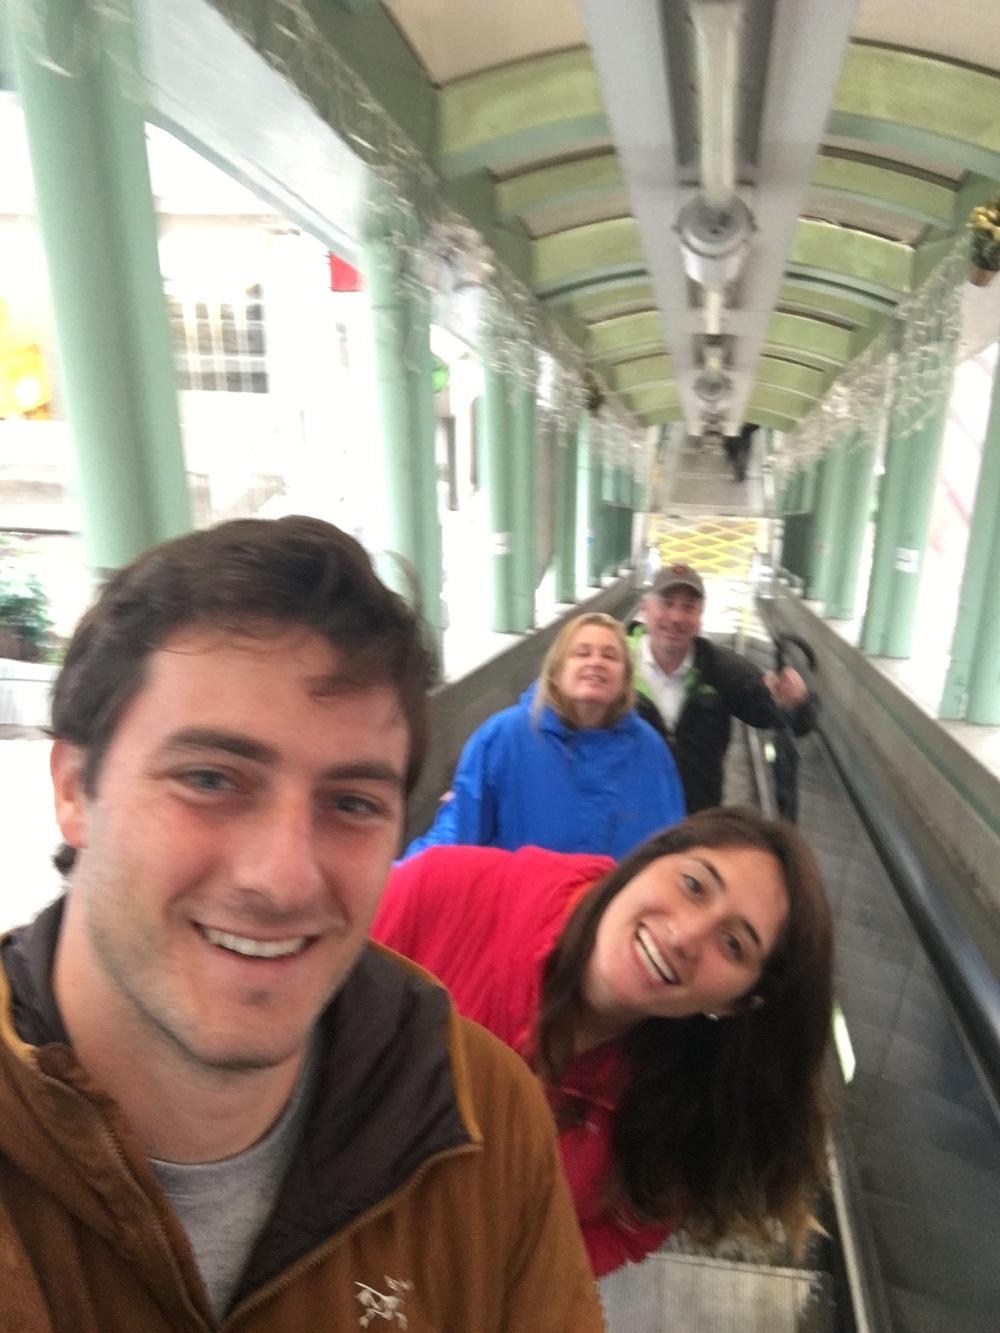 Family escalator selfie